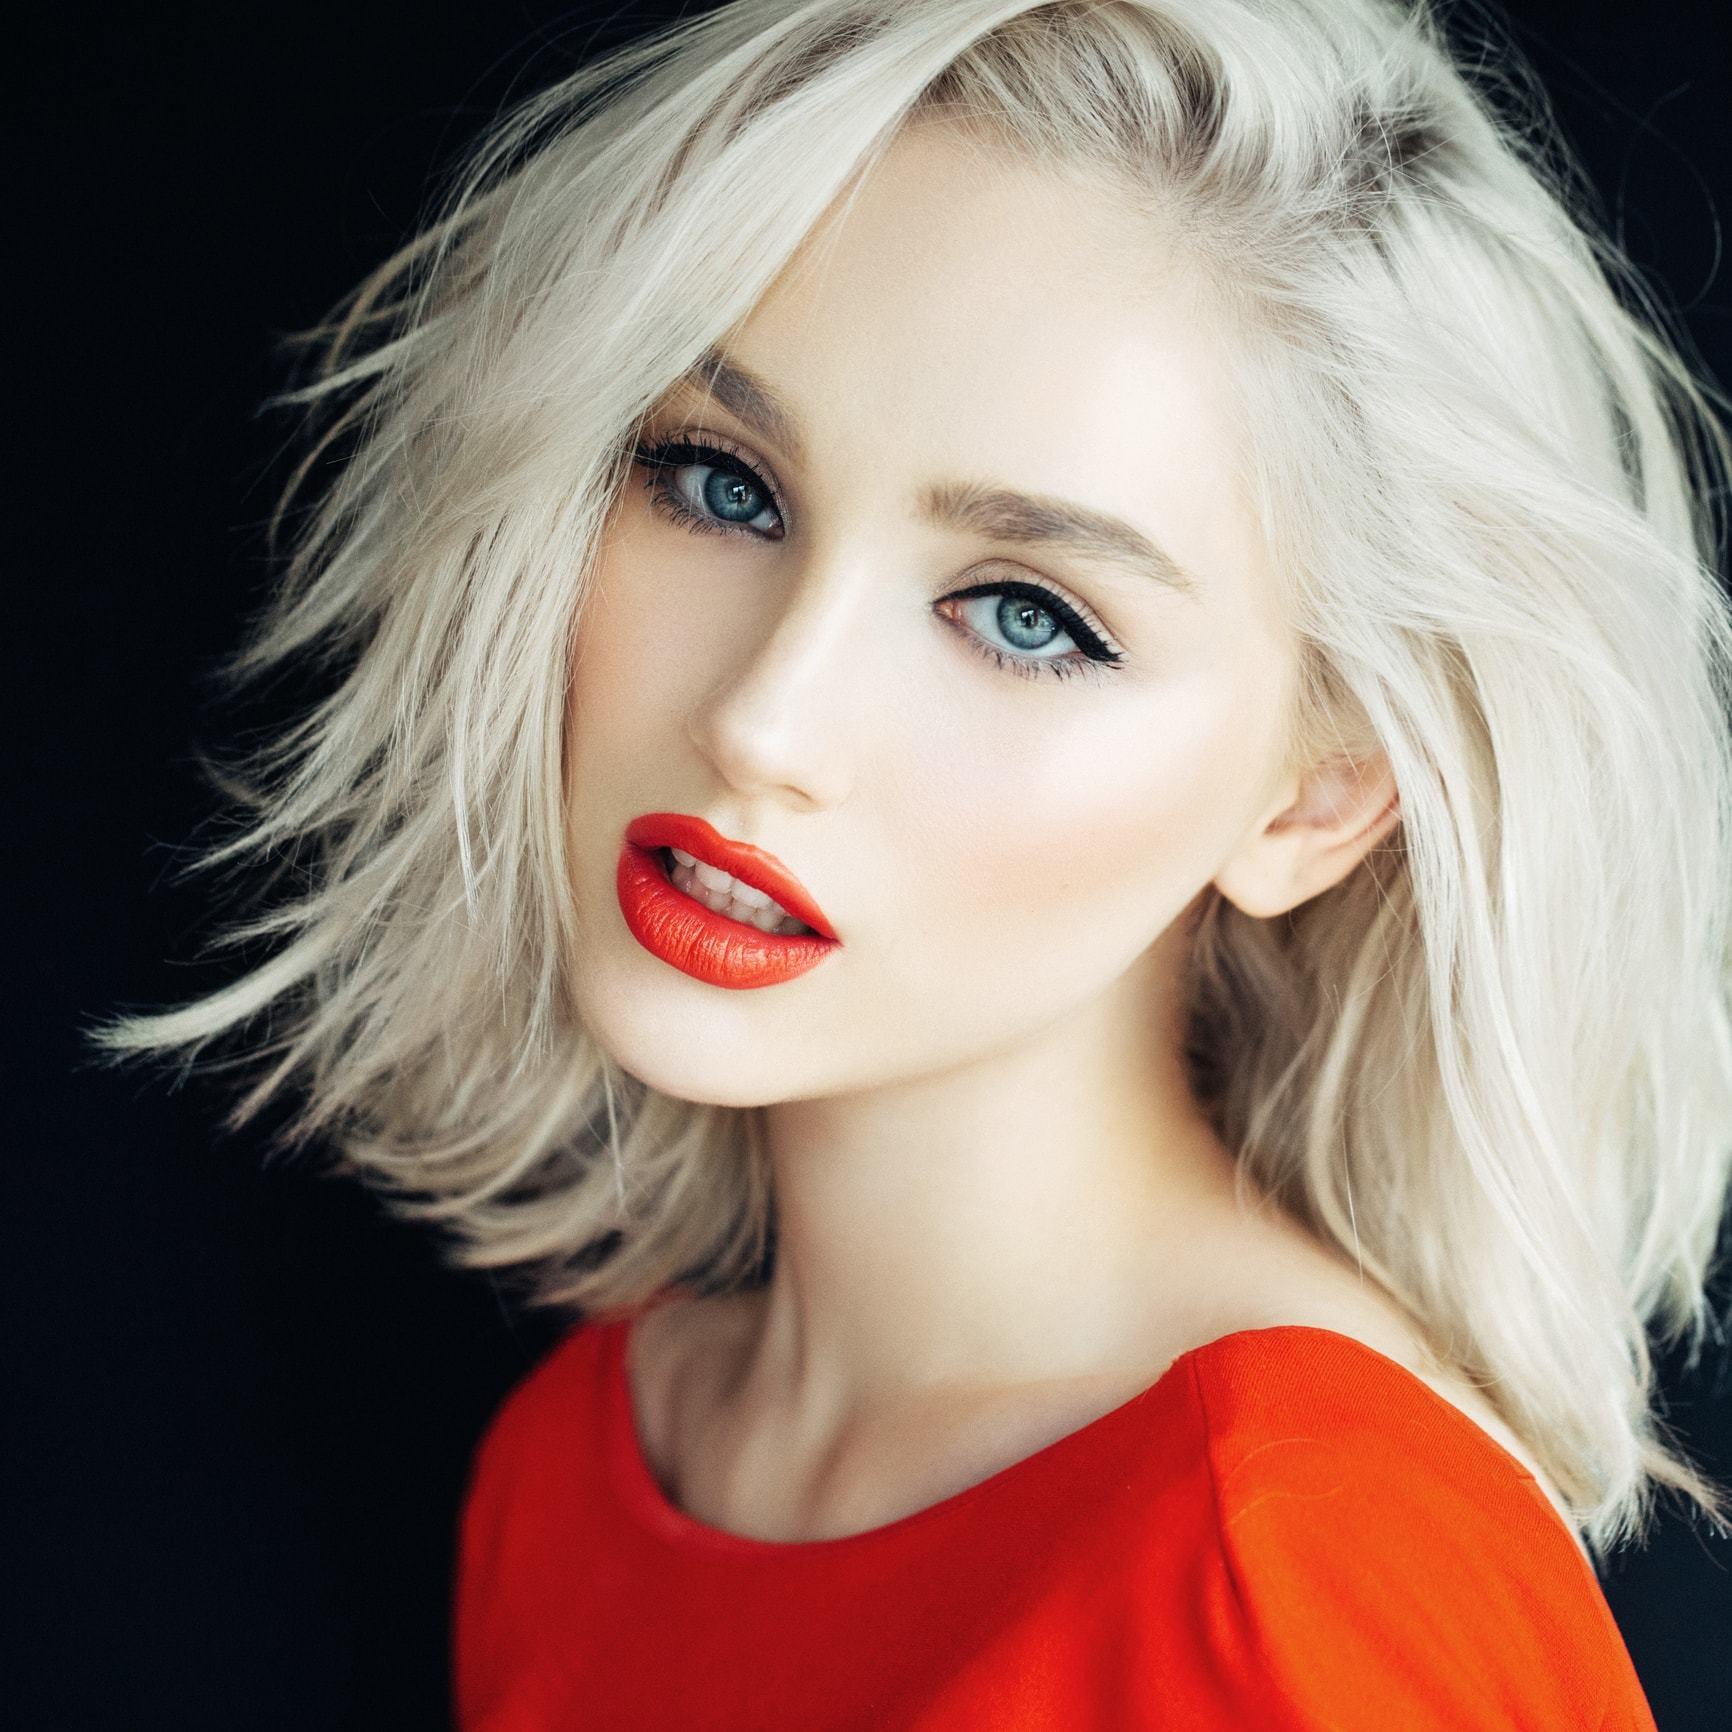 white blonde hair straight volume